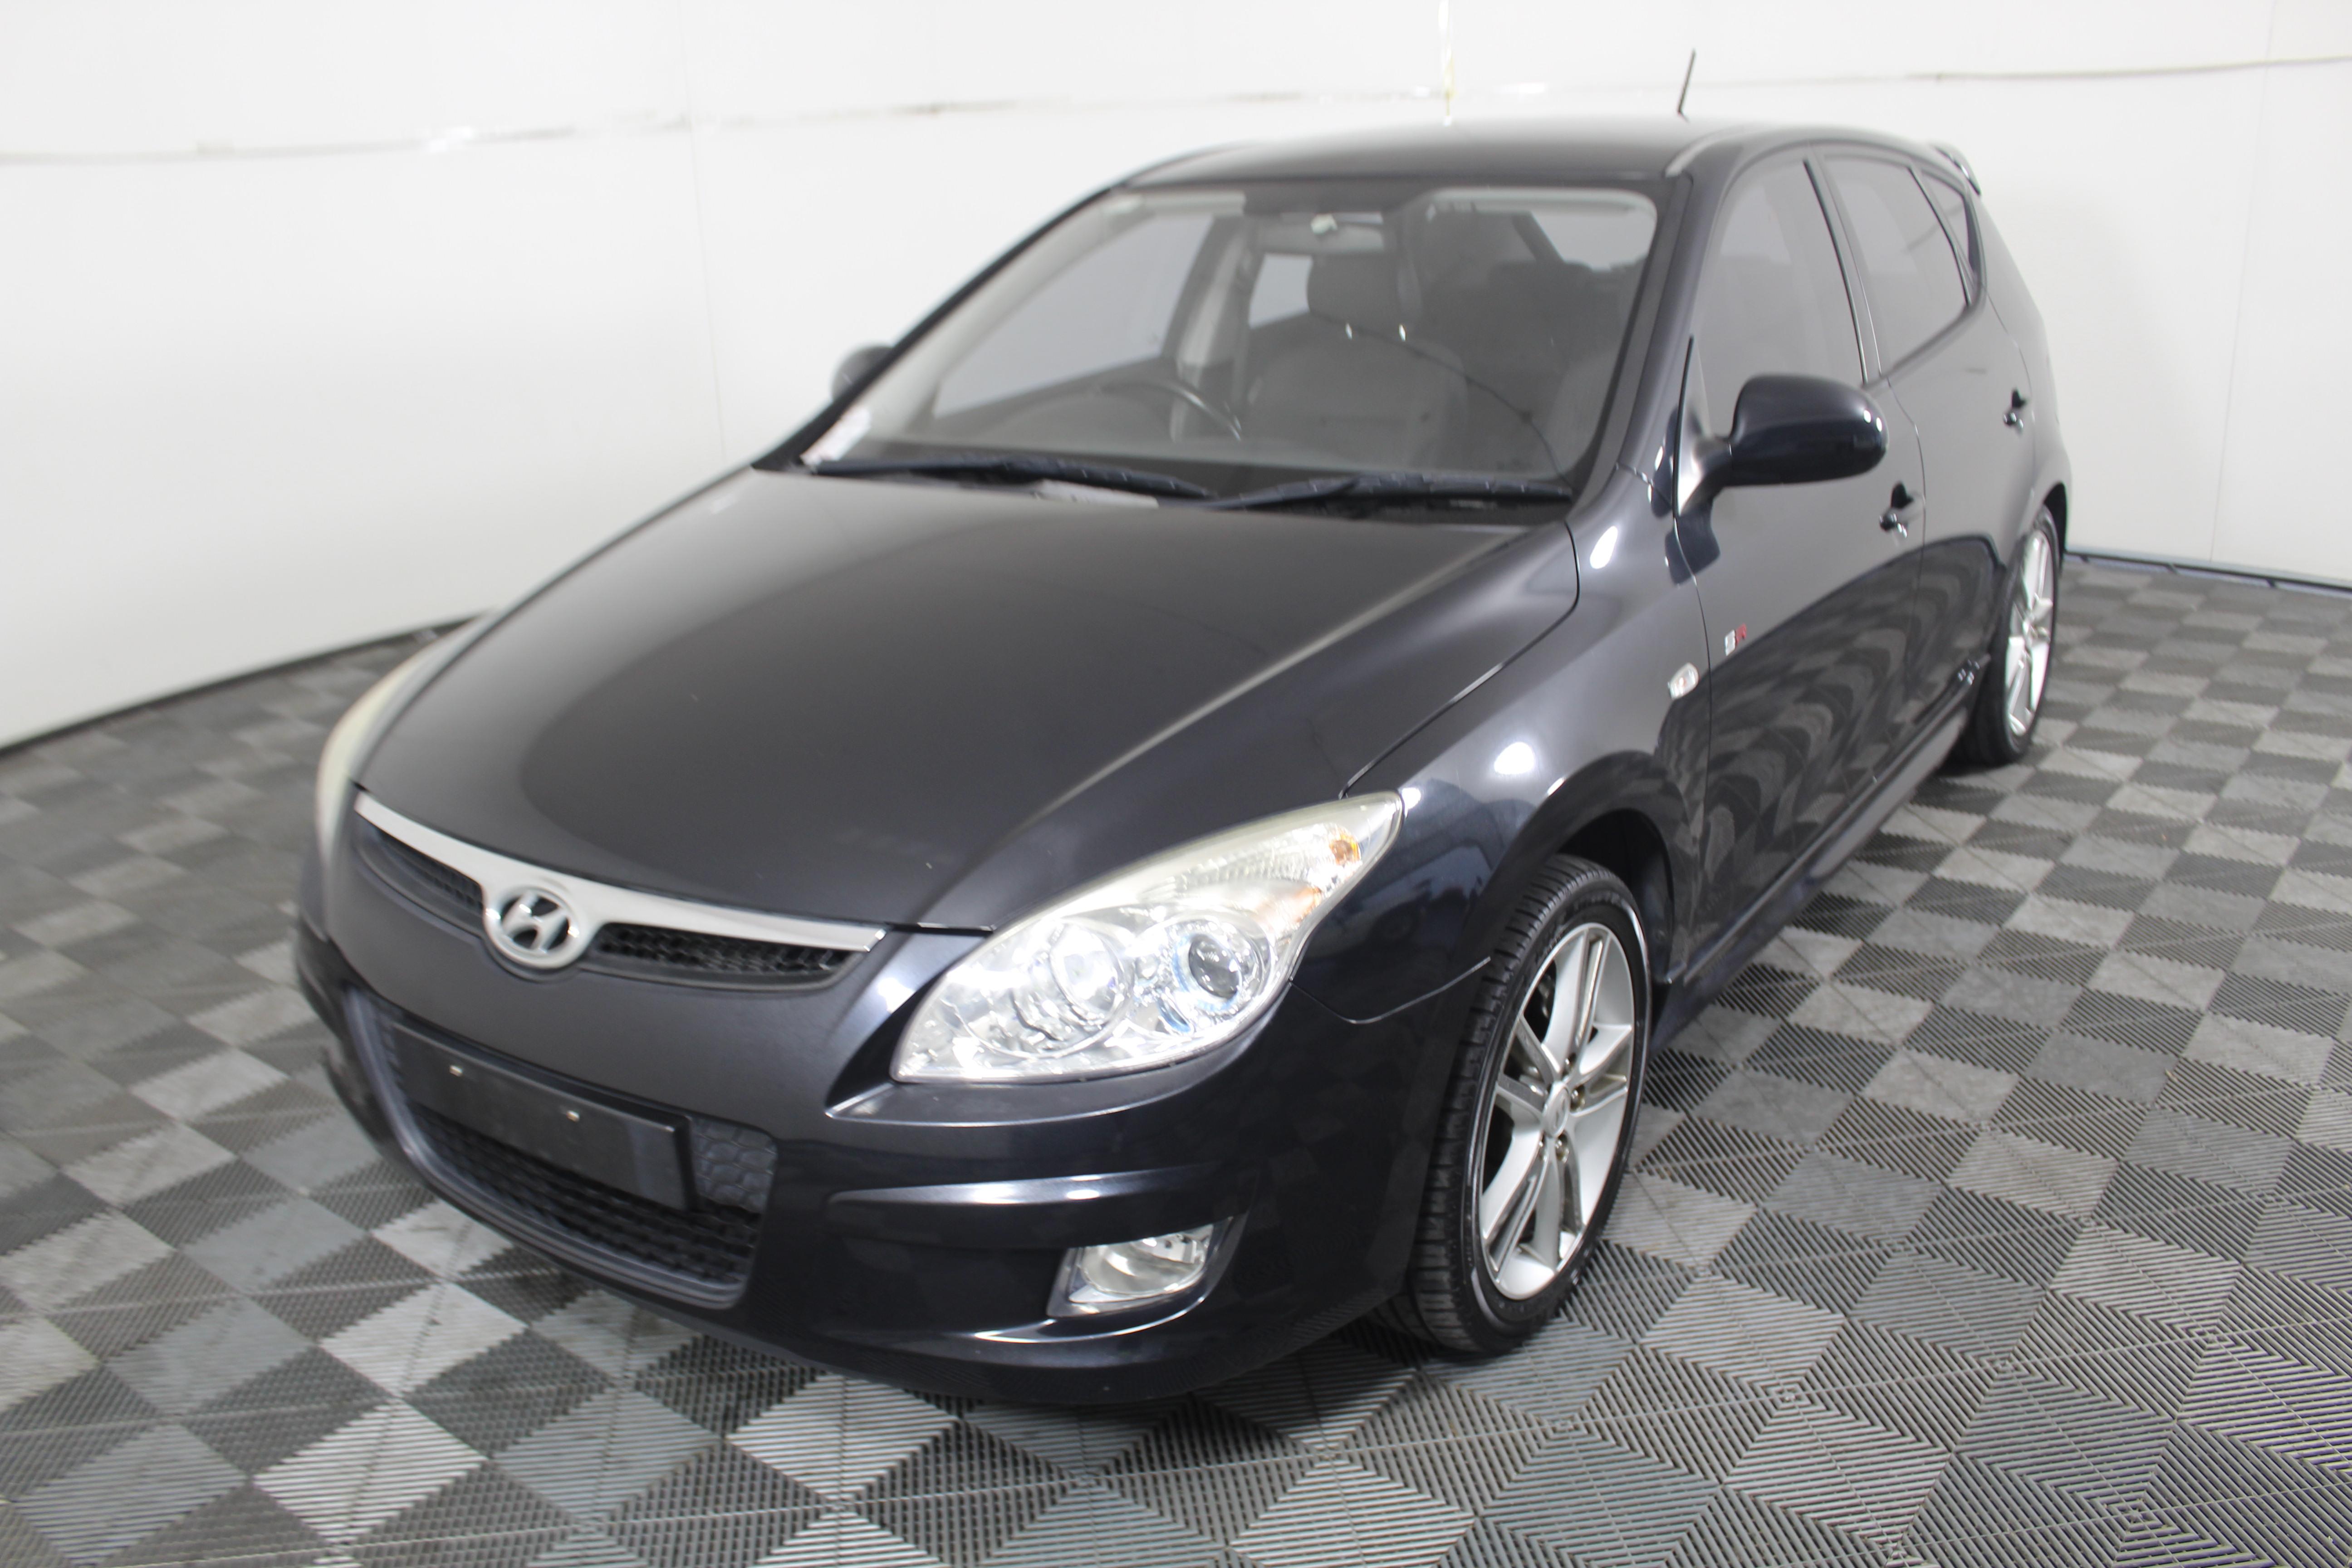 2009 (2010 Comp) Hyundai i30 SR Auto 5D Hatch 90,276kms